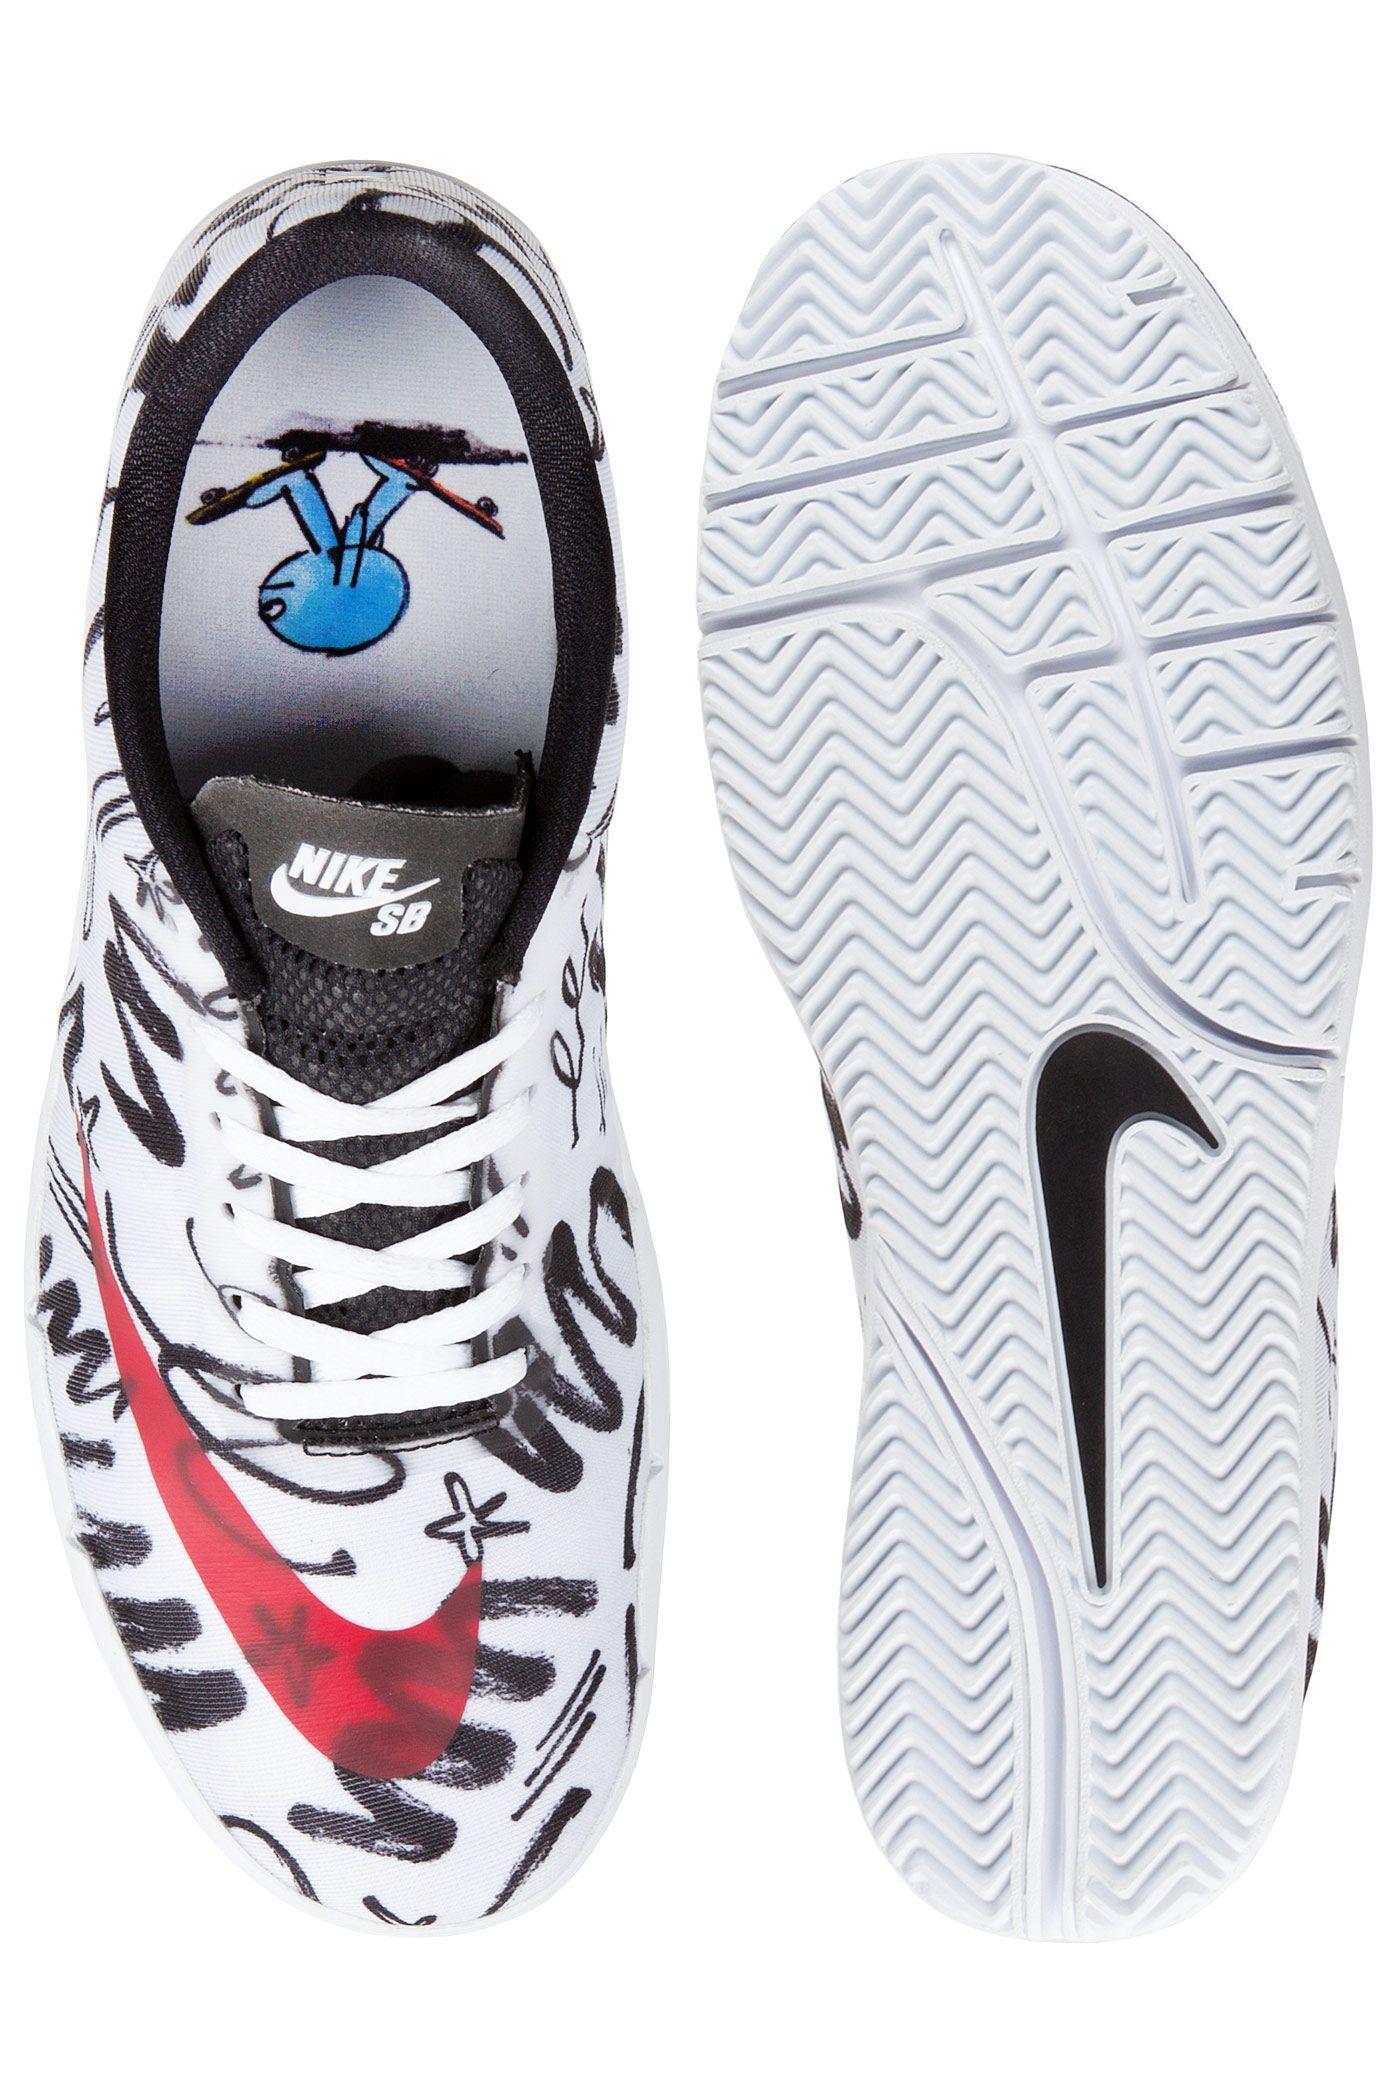 Nike SB Free R R (white QS James Jarvis Chaussure (white R gym red d398a0